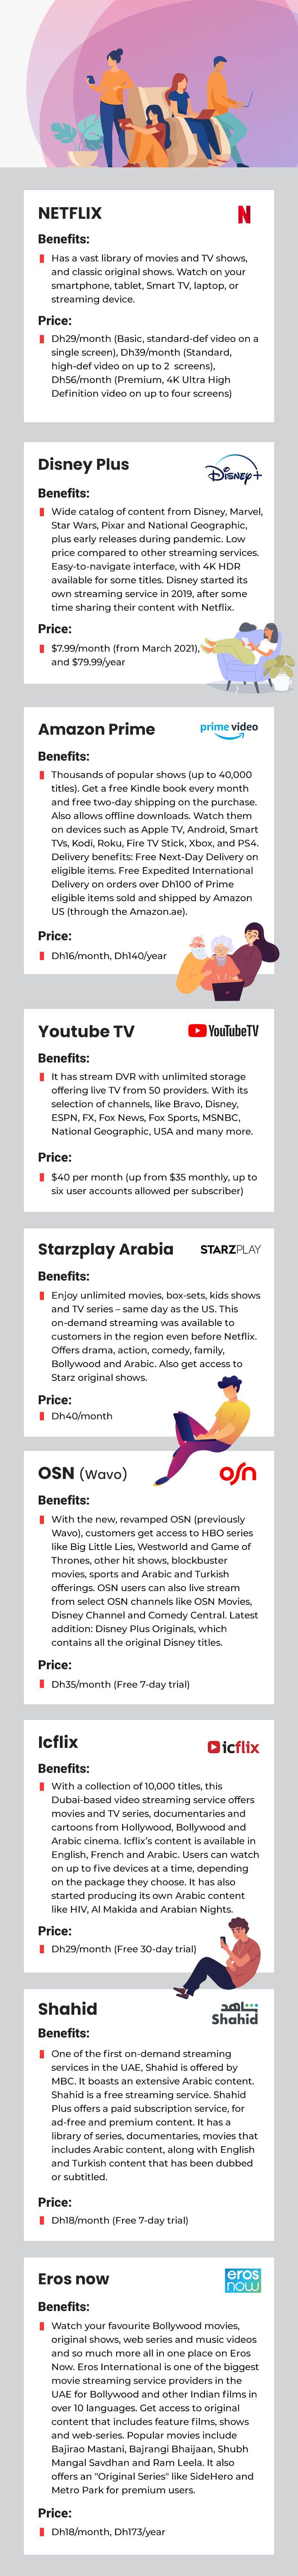 video streaming services comparison